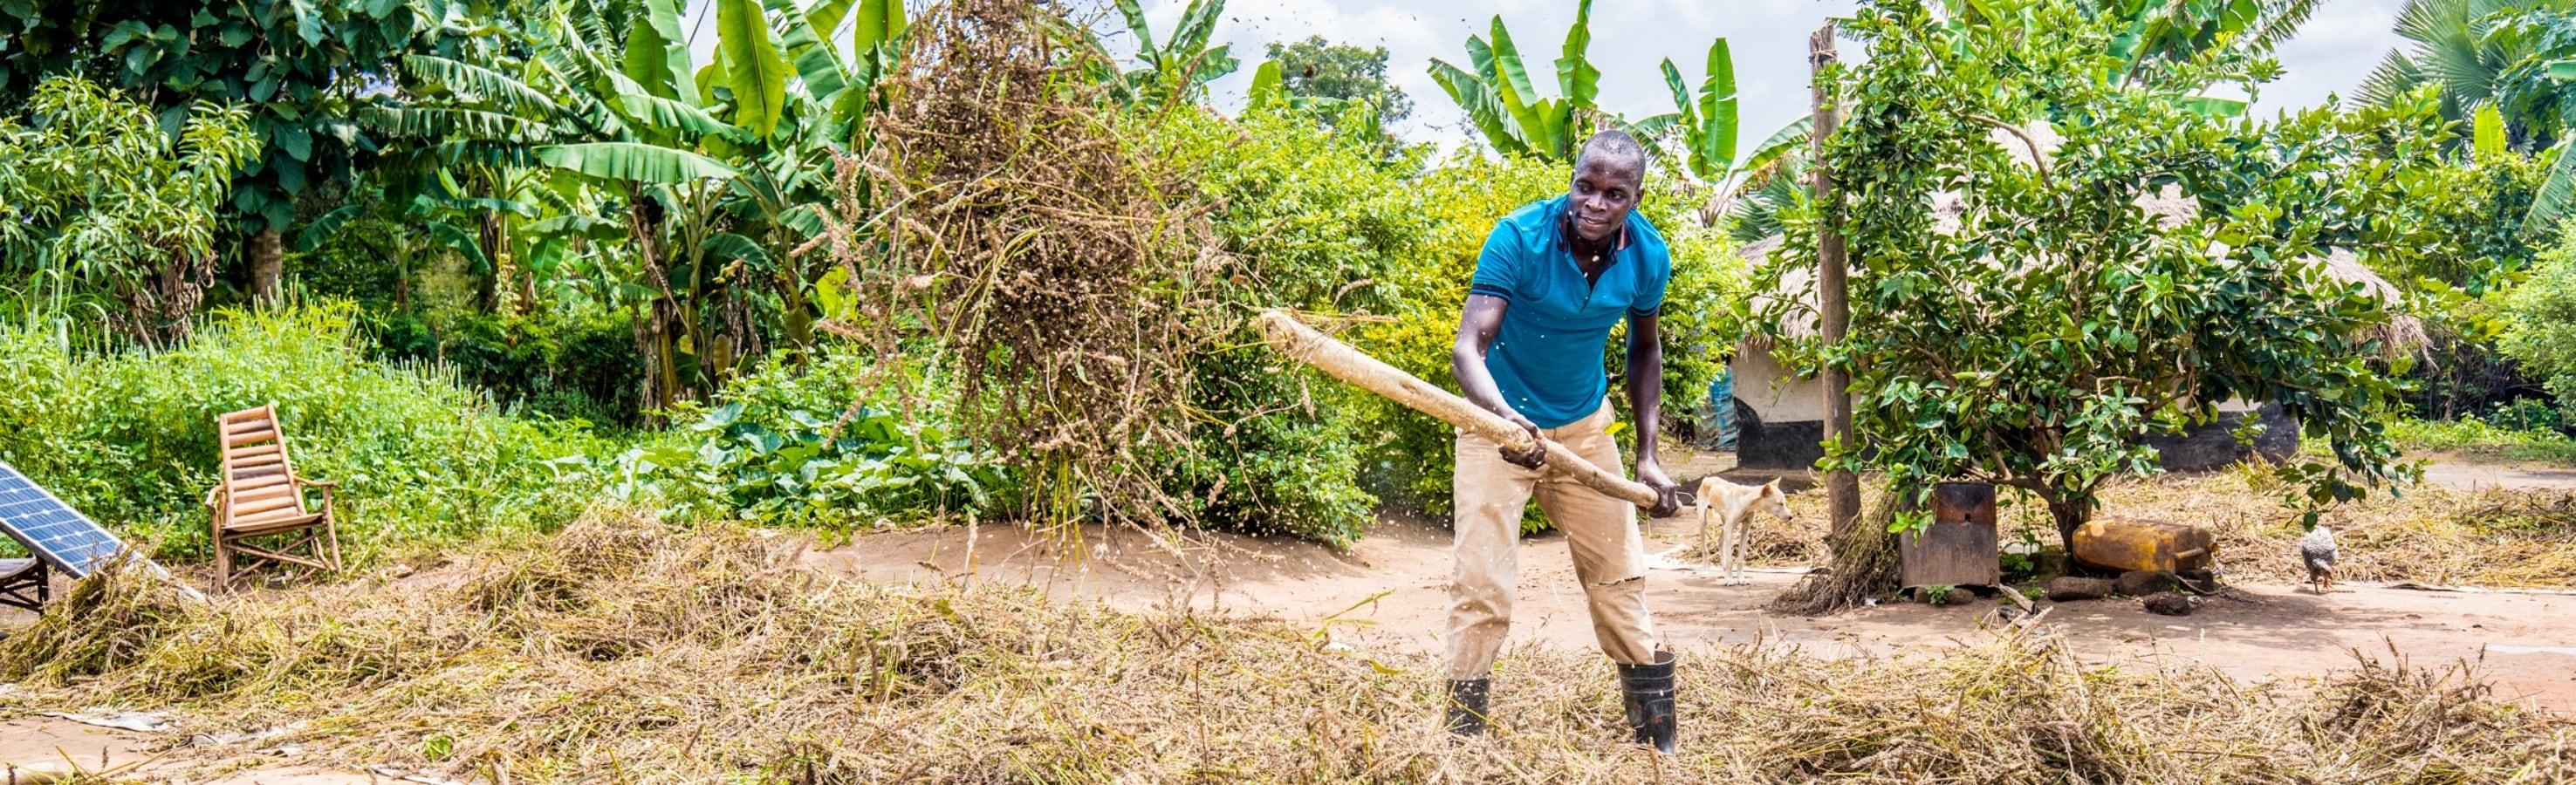 Smallholder farmer is harvesting in Africa